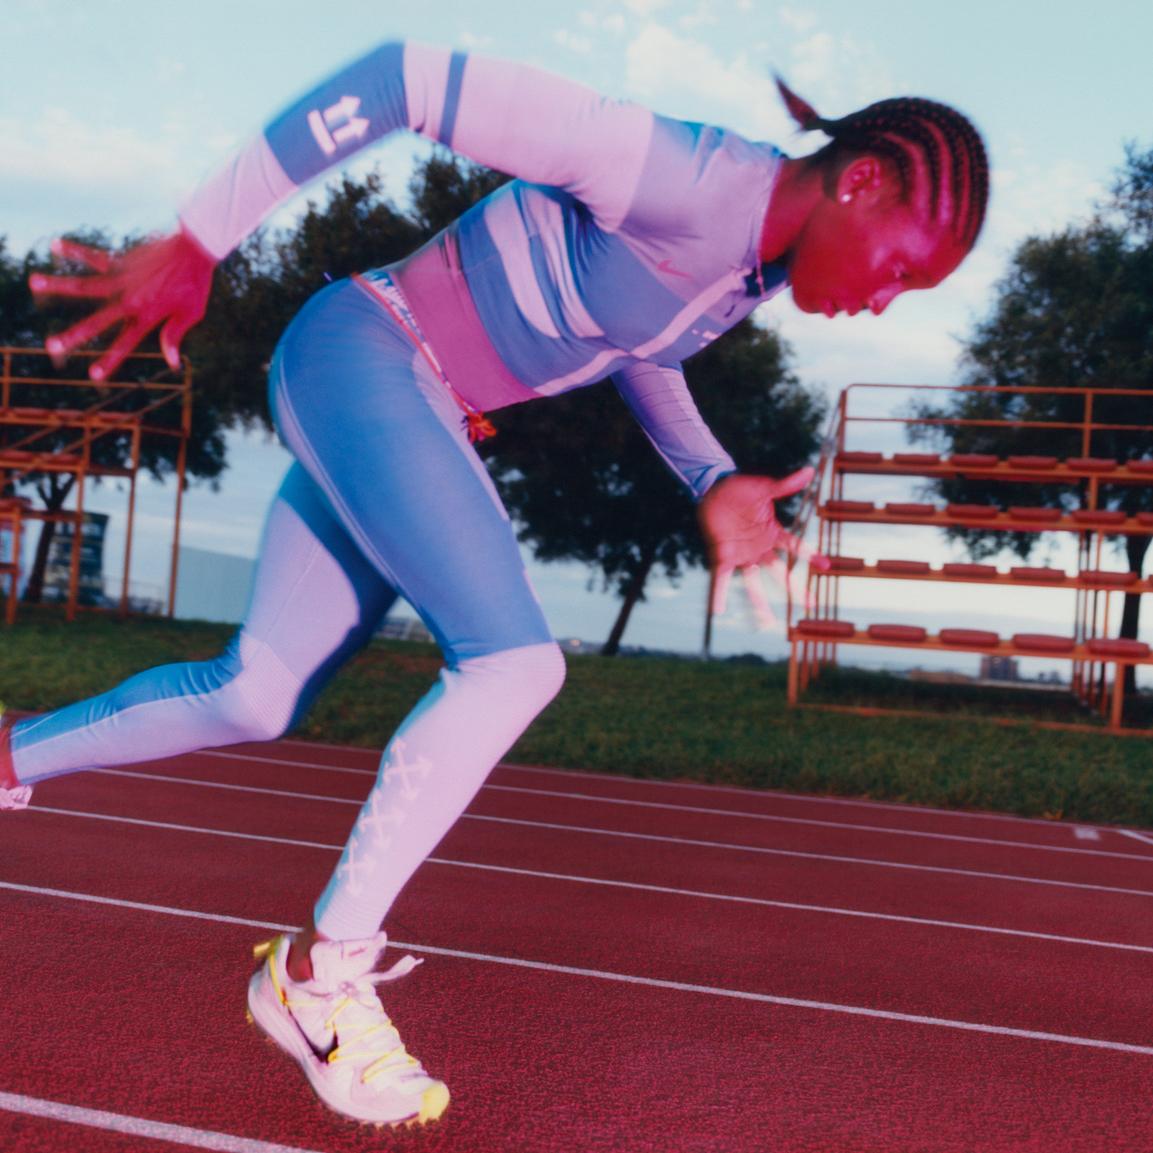 <p>三大重點解析 Nike x Virgil Abloh「Athlete in Progress」系列</p>